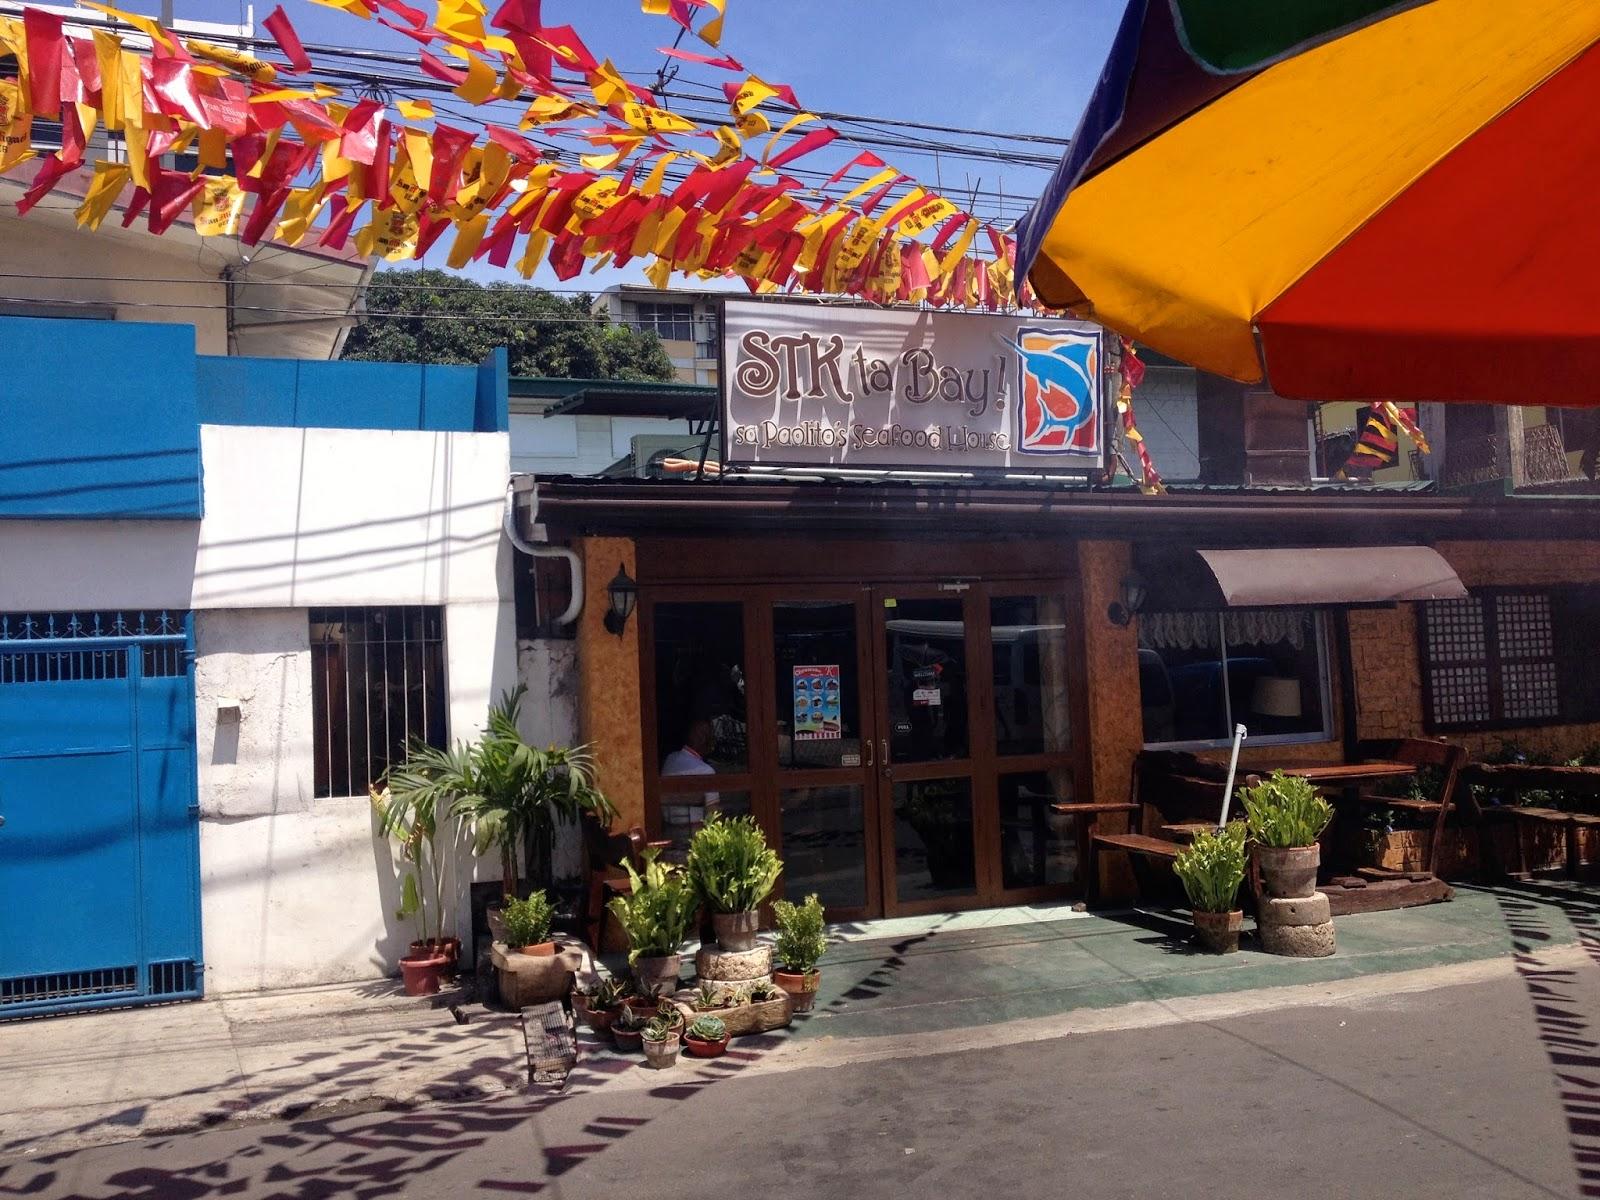 STK ta Bay sa Paolito's Seafood House, No.6 Orchid Street, Capitol Site, Cebu City